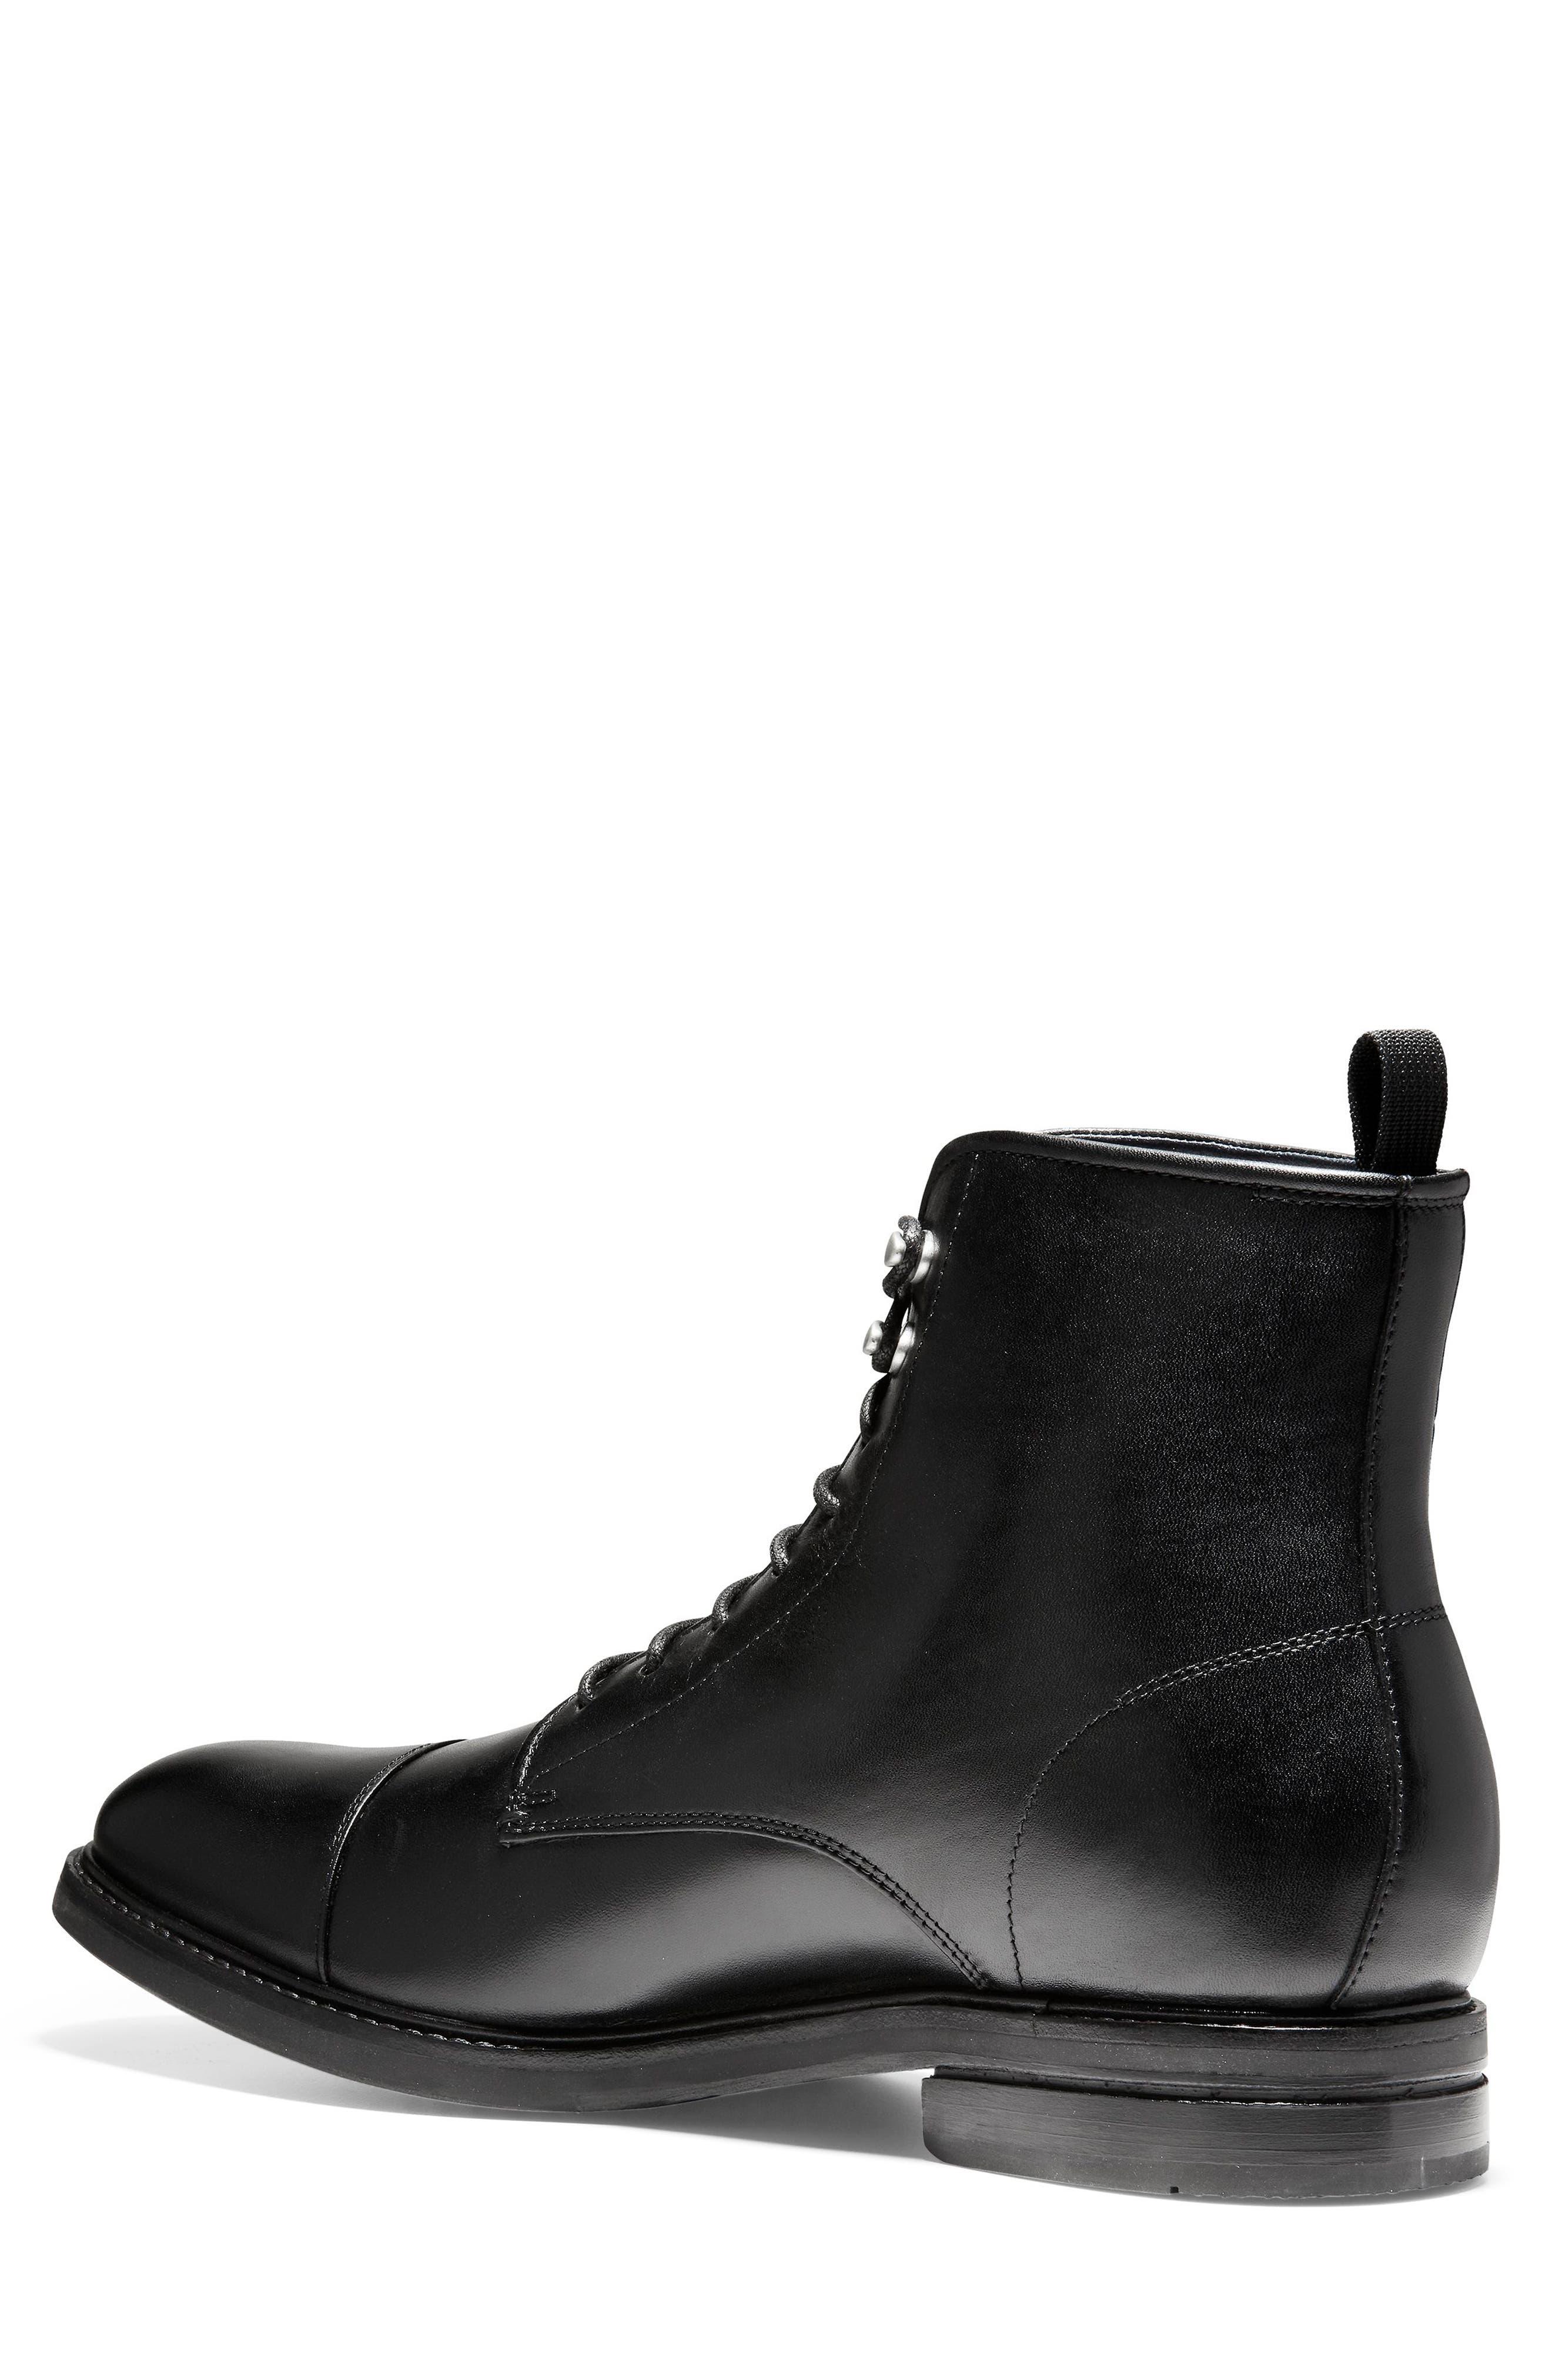 Wagner Grand Cap Toe Boot,                             Alternate thumbnail 2, color,                             BLACK LEATHER